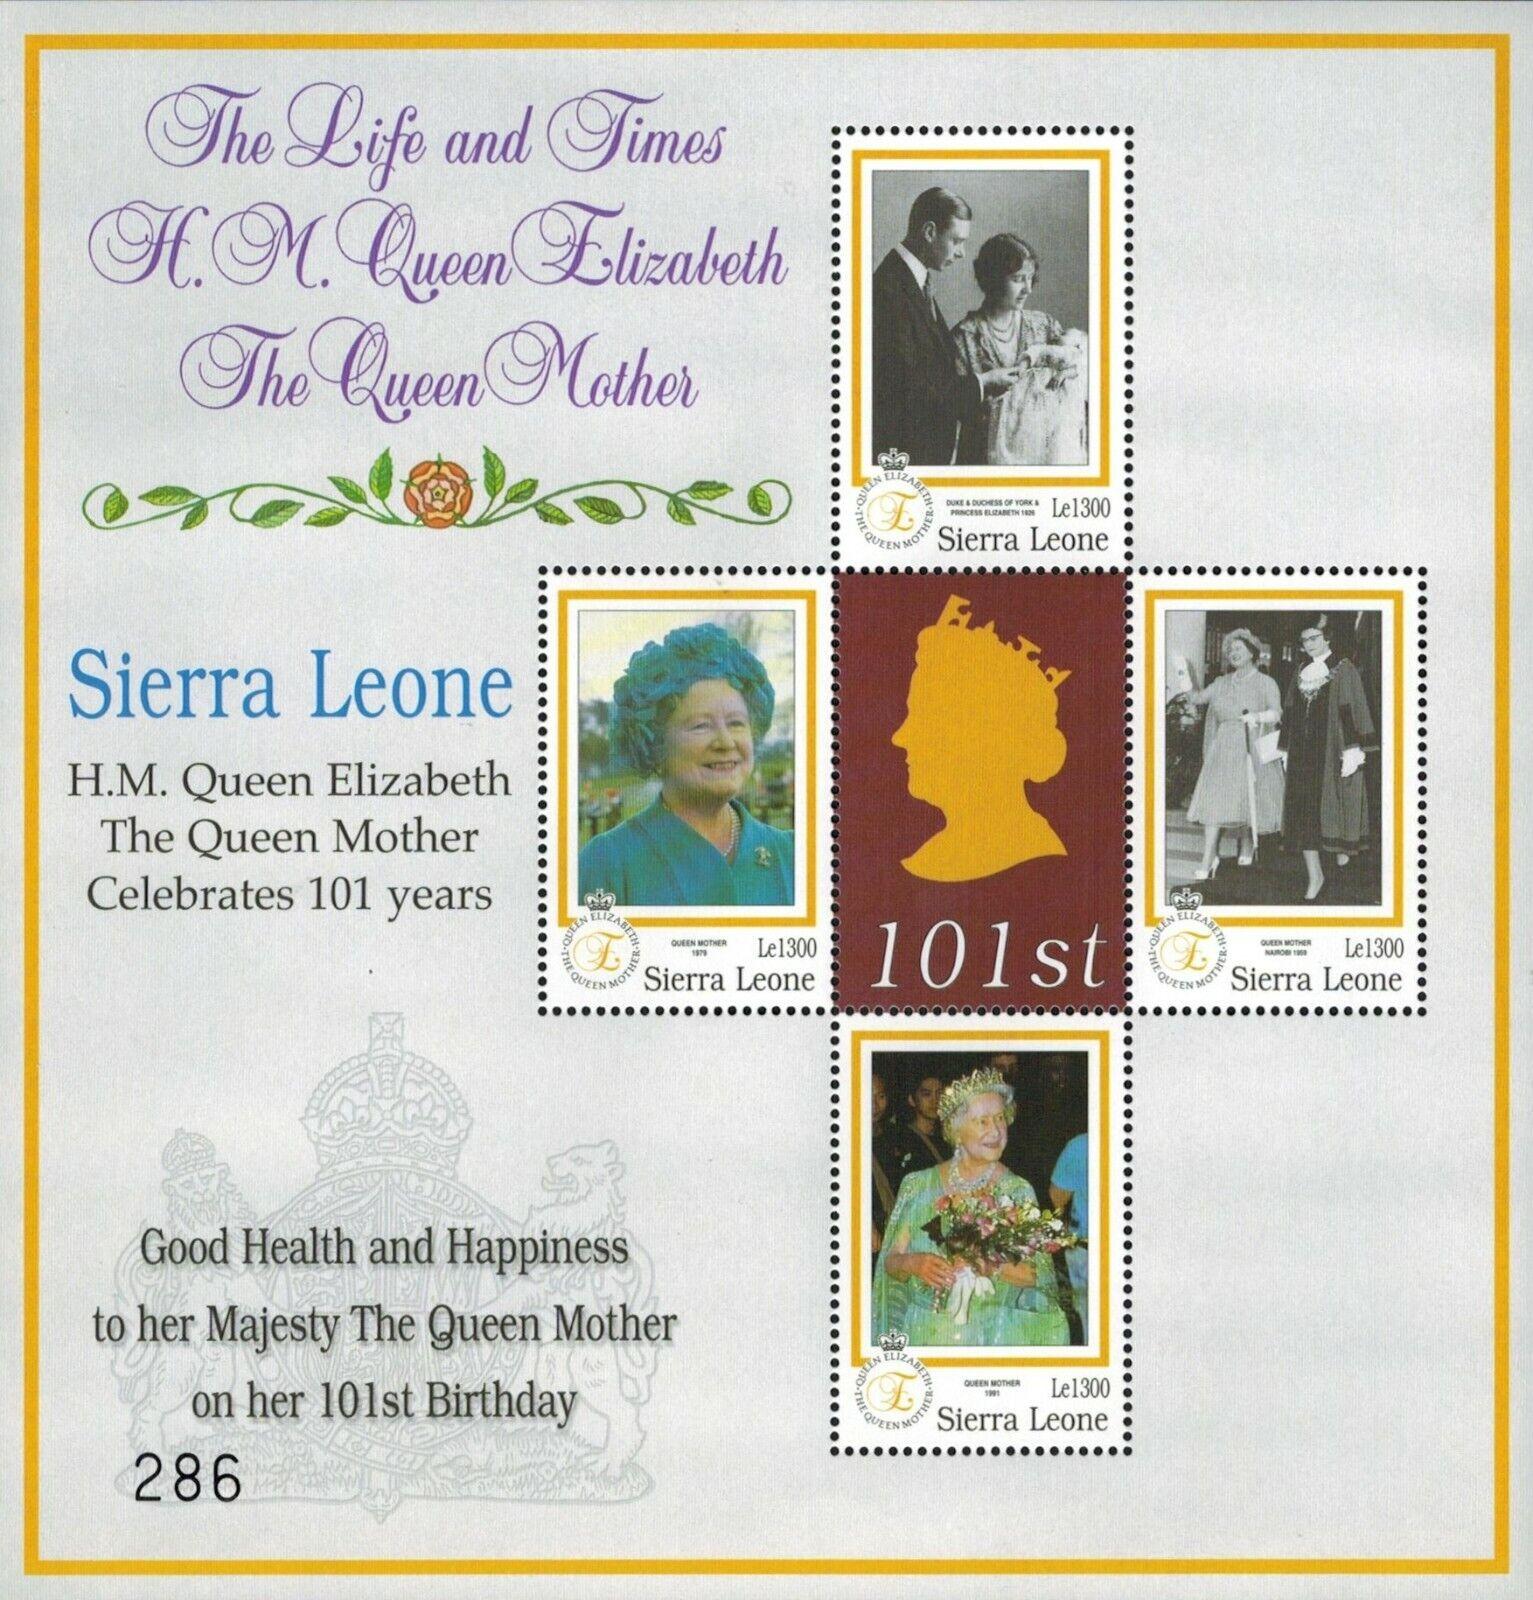 MODERN GEMS -Sierra Leone - Queen Mother s 101st Birthday - Sheet Of 4 - MNH - $0.89